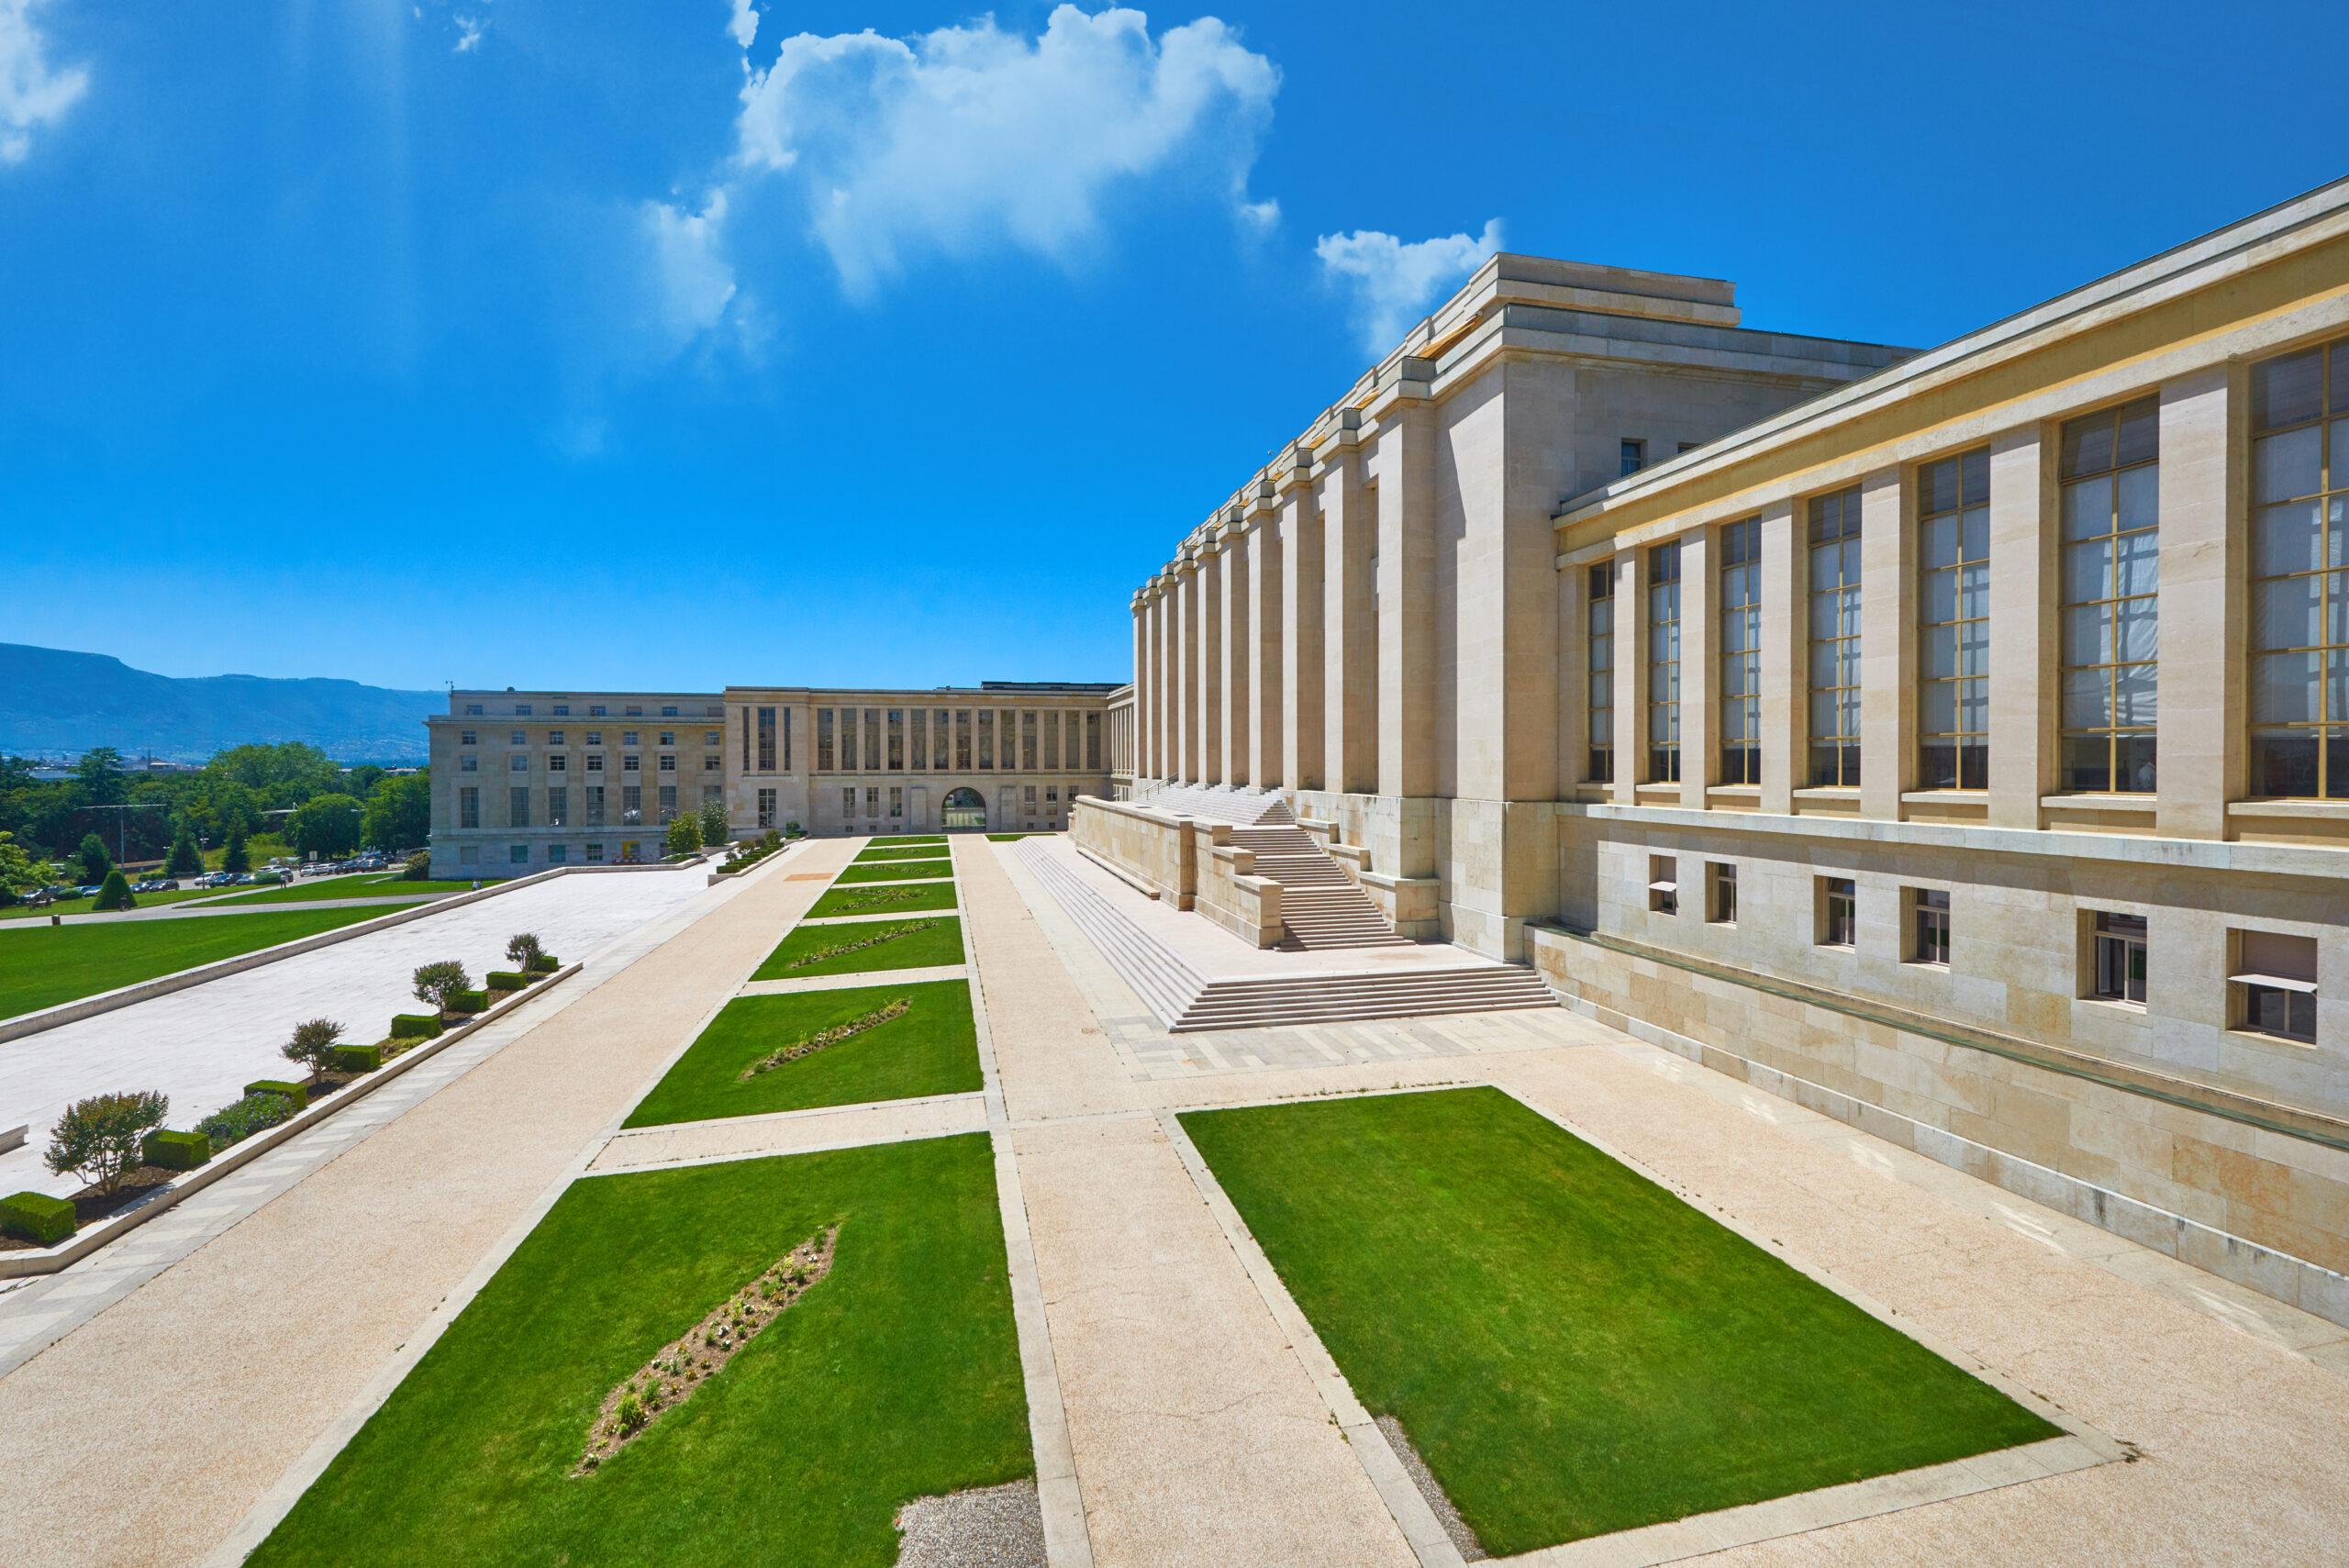 Geneva,,Switzerland, ,June,2019:,Park,In,The,United,Nations